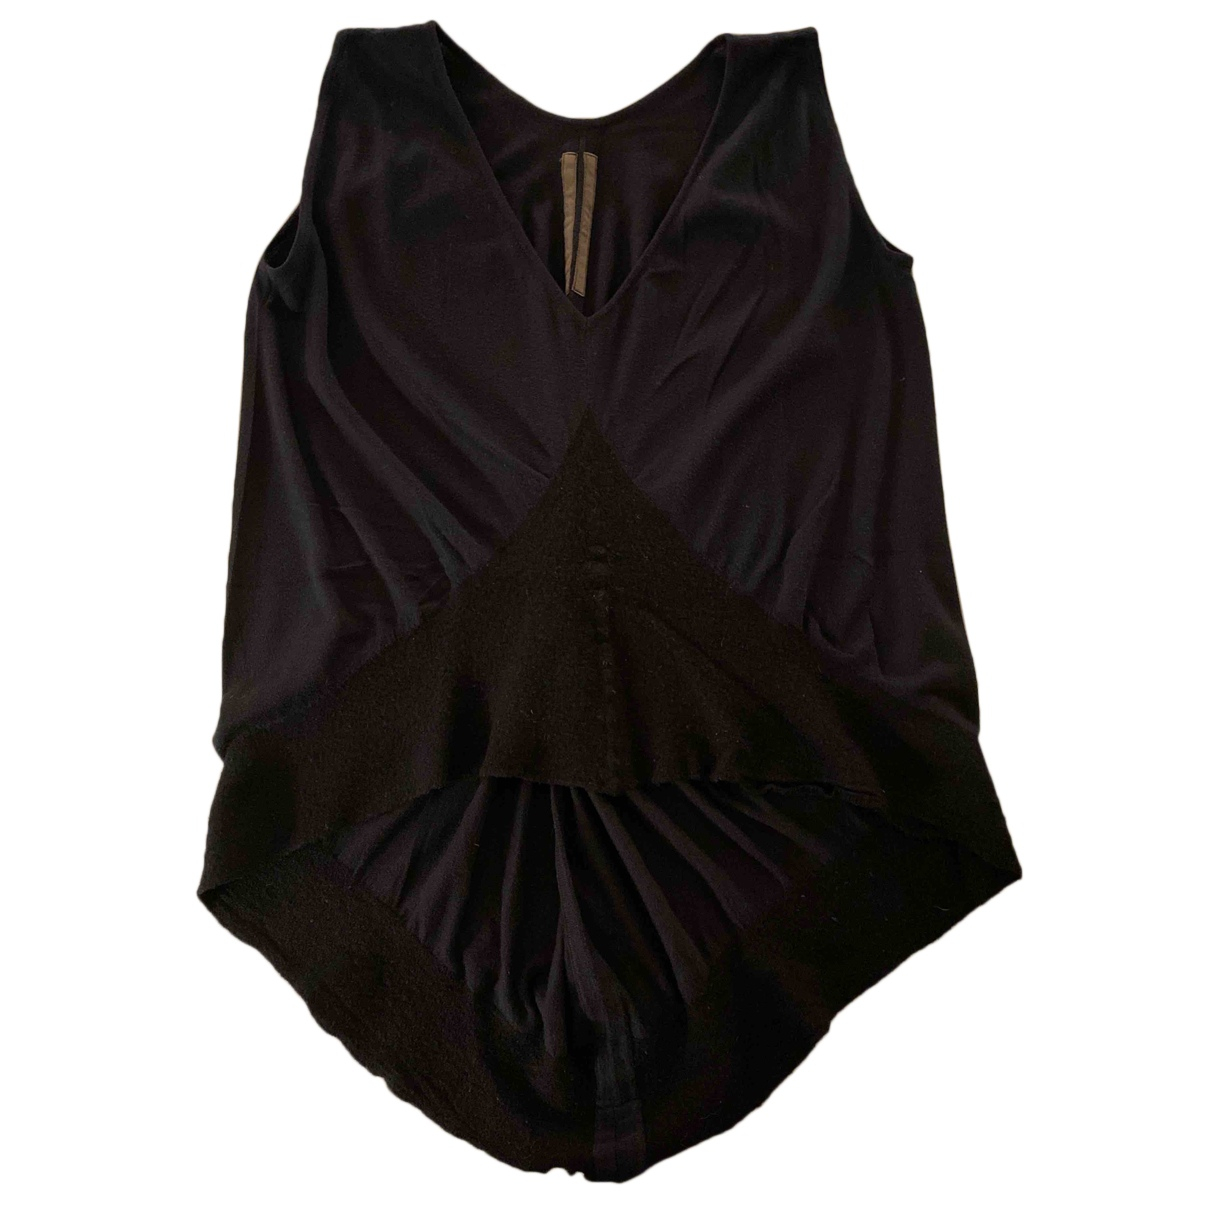 Rick Owens N Black Cashmere Knitwear for Women S International